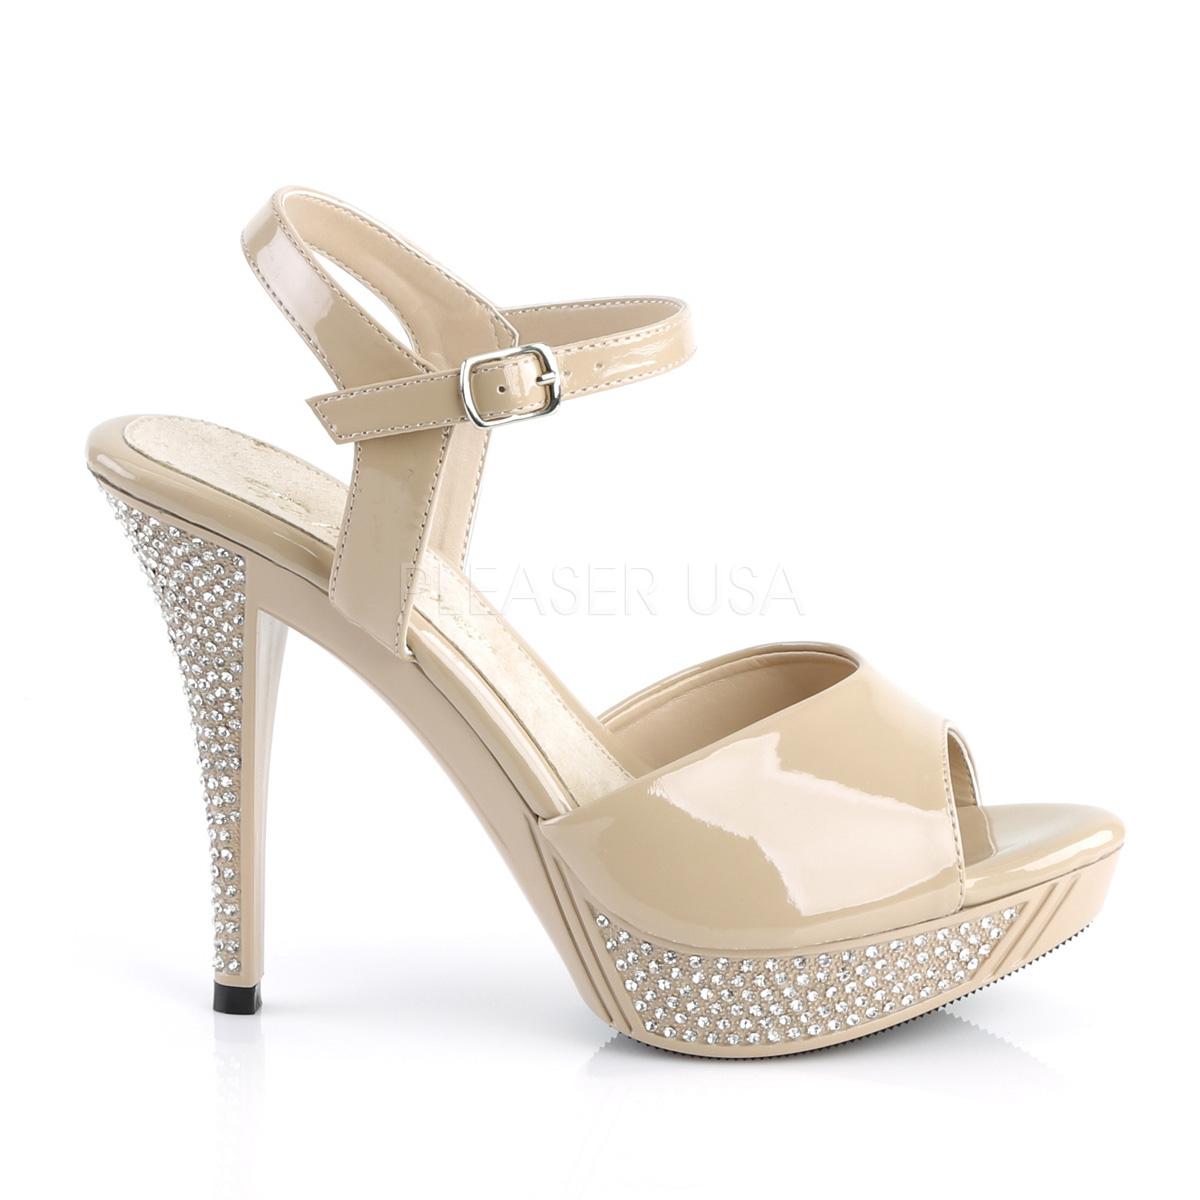 409 Mujer Sandalias Plataforma Cm Elegant 12 Beige Strass mNvwn0O8